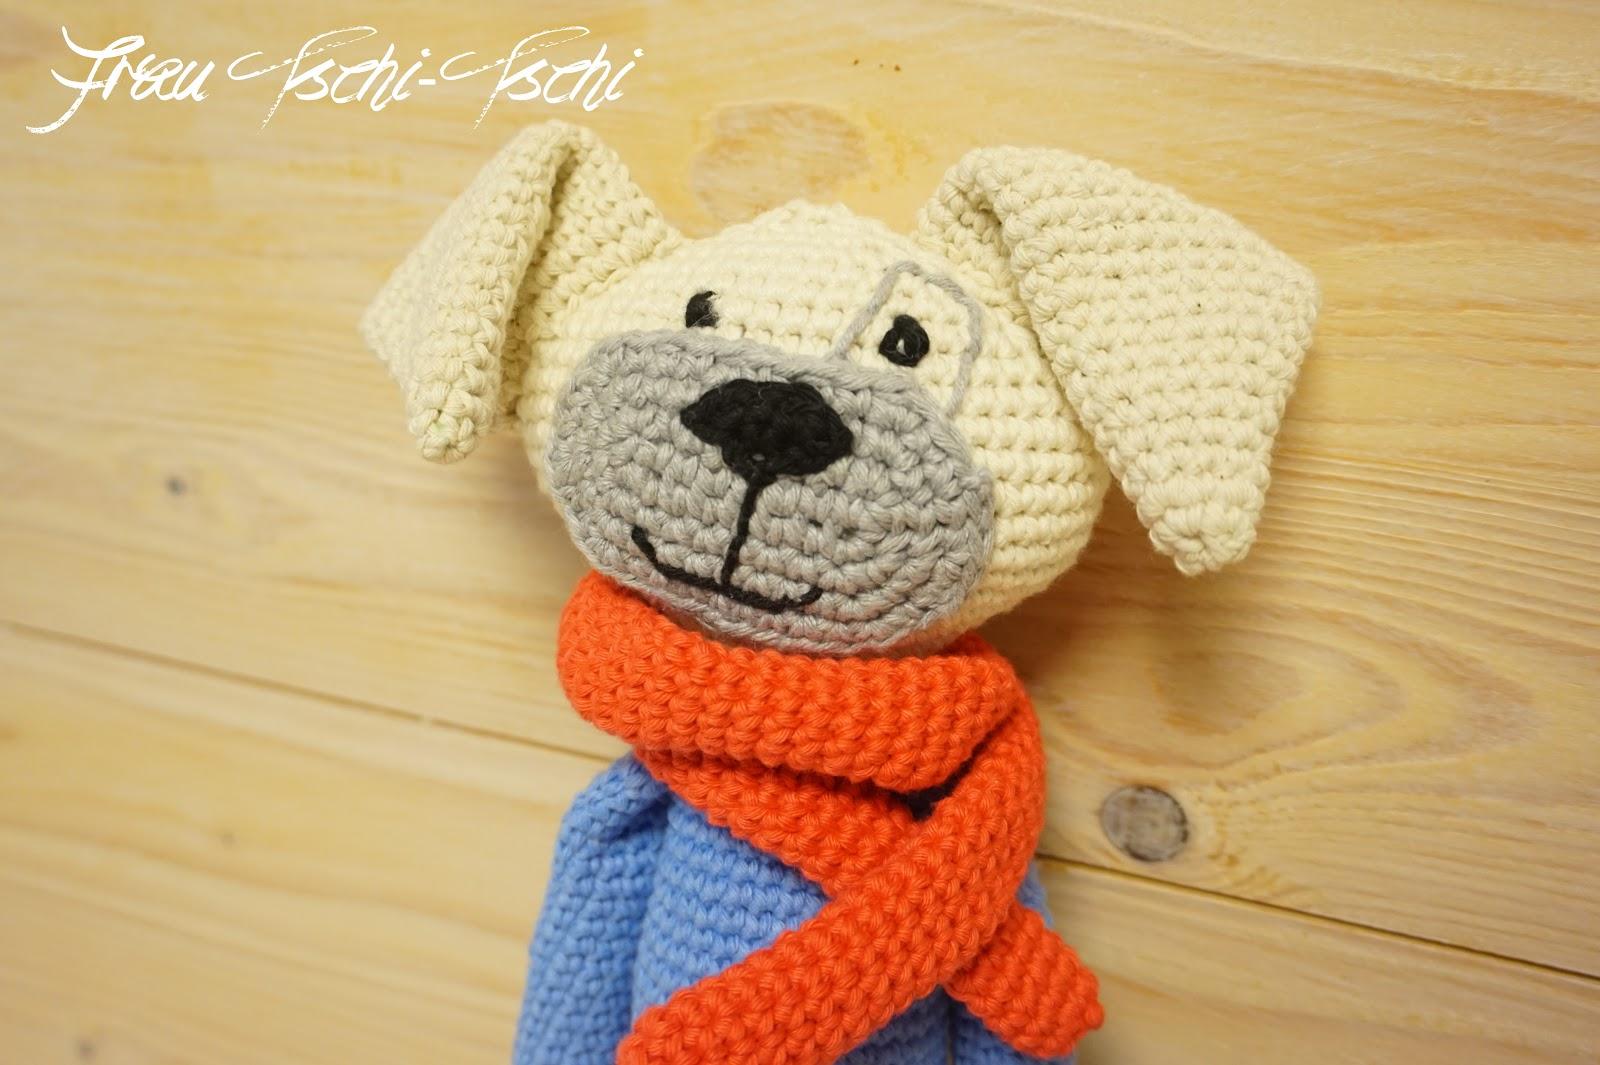 Frau Tschi-Tschi: Amigurumi dog - crochet pattern free